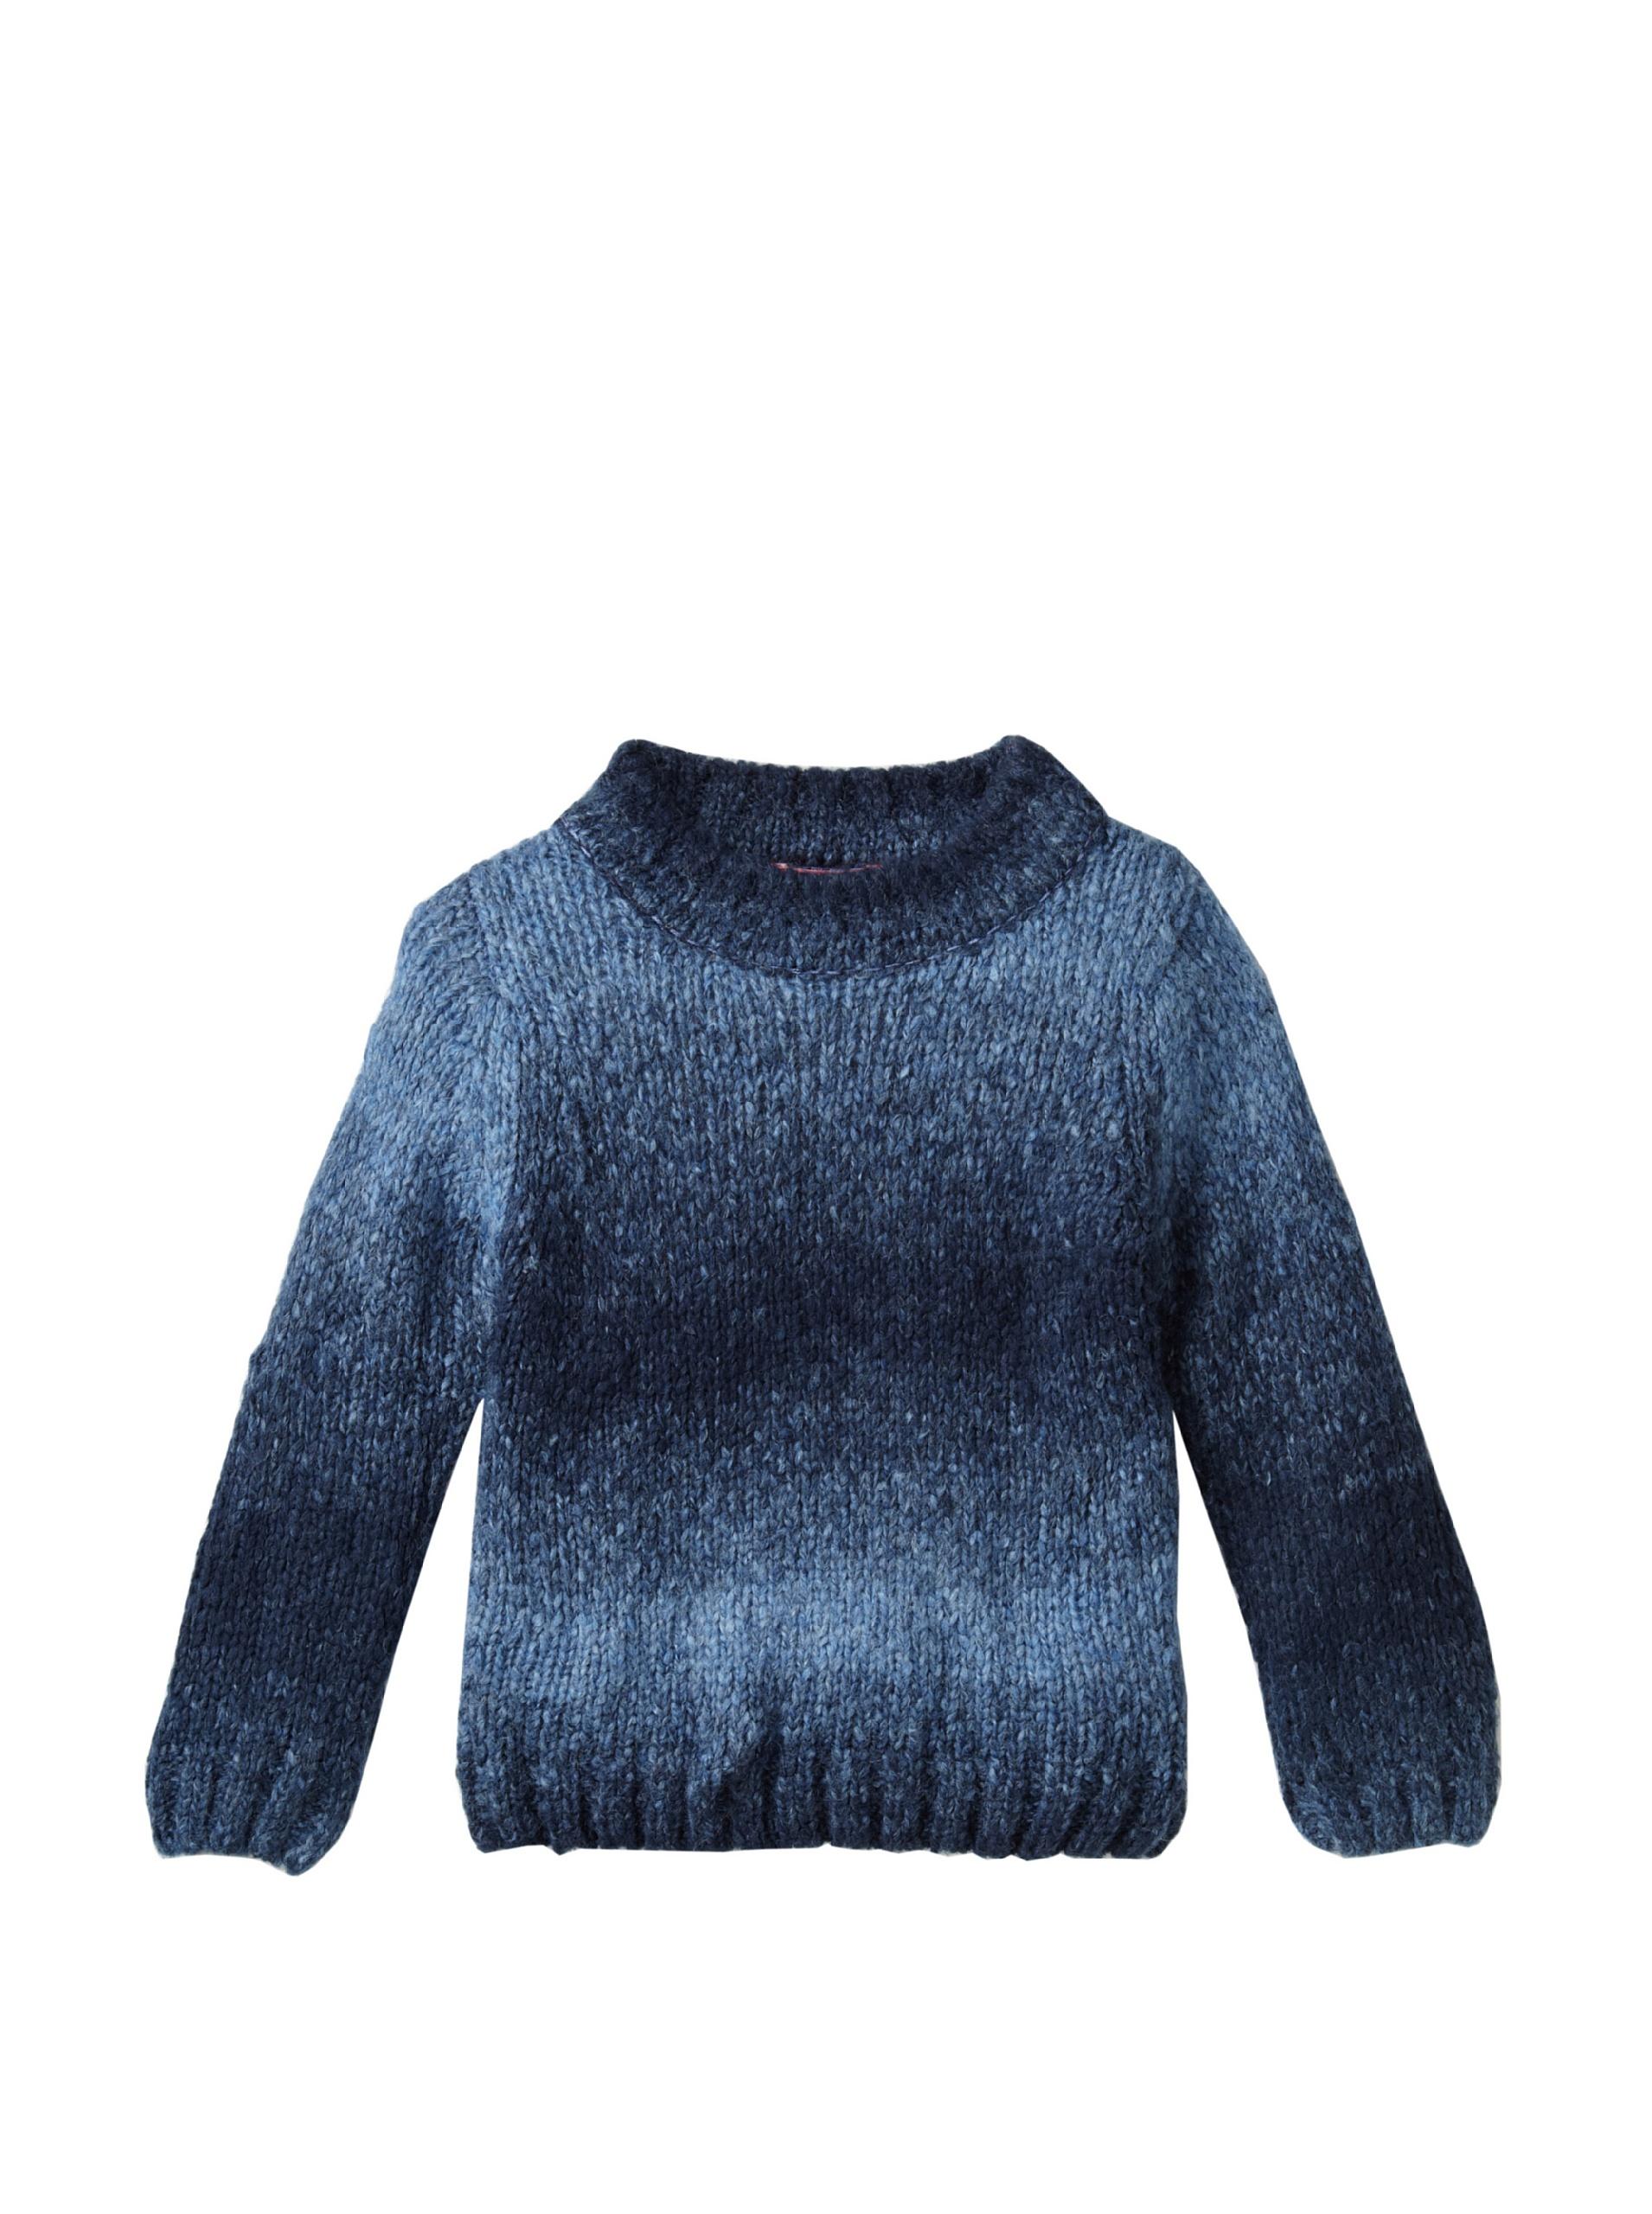 One Kid Boy's Ombre Sweater (Blue)